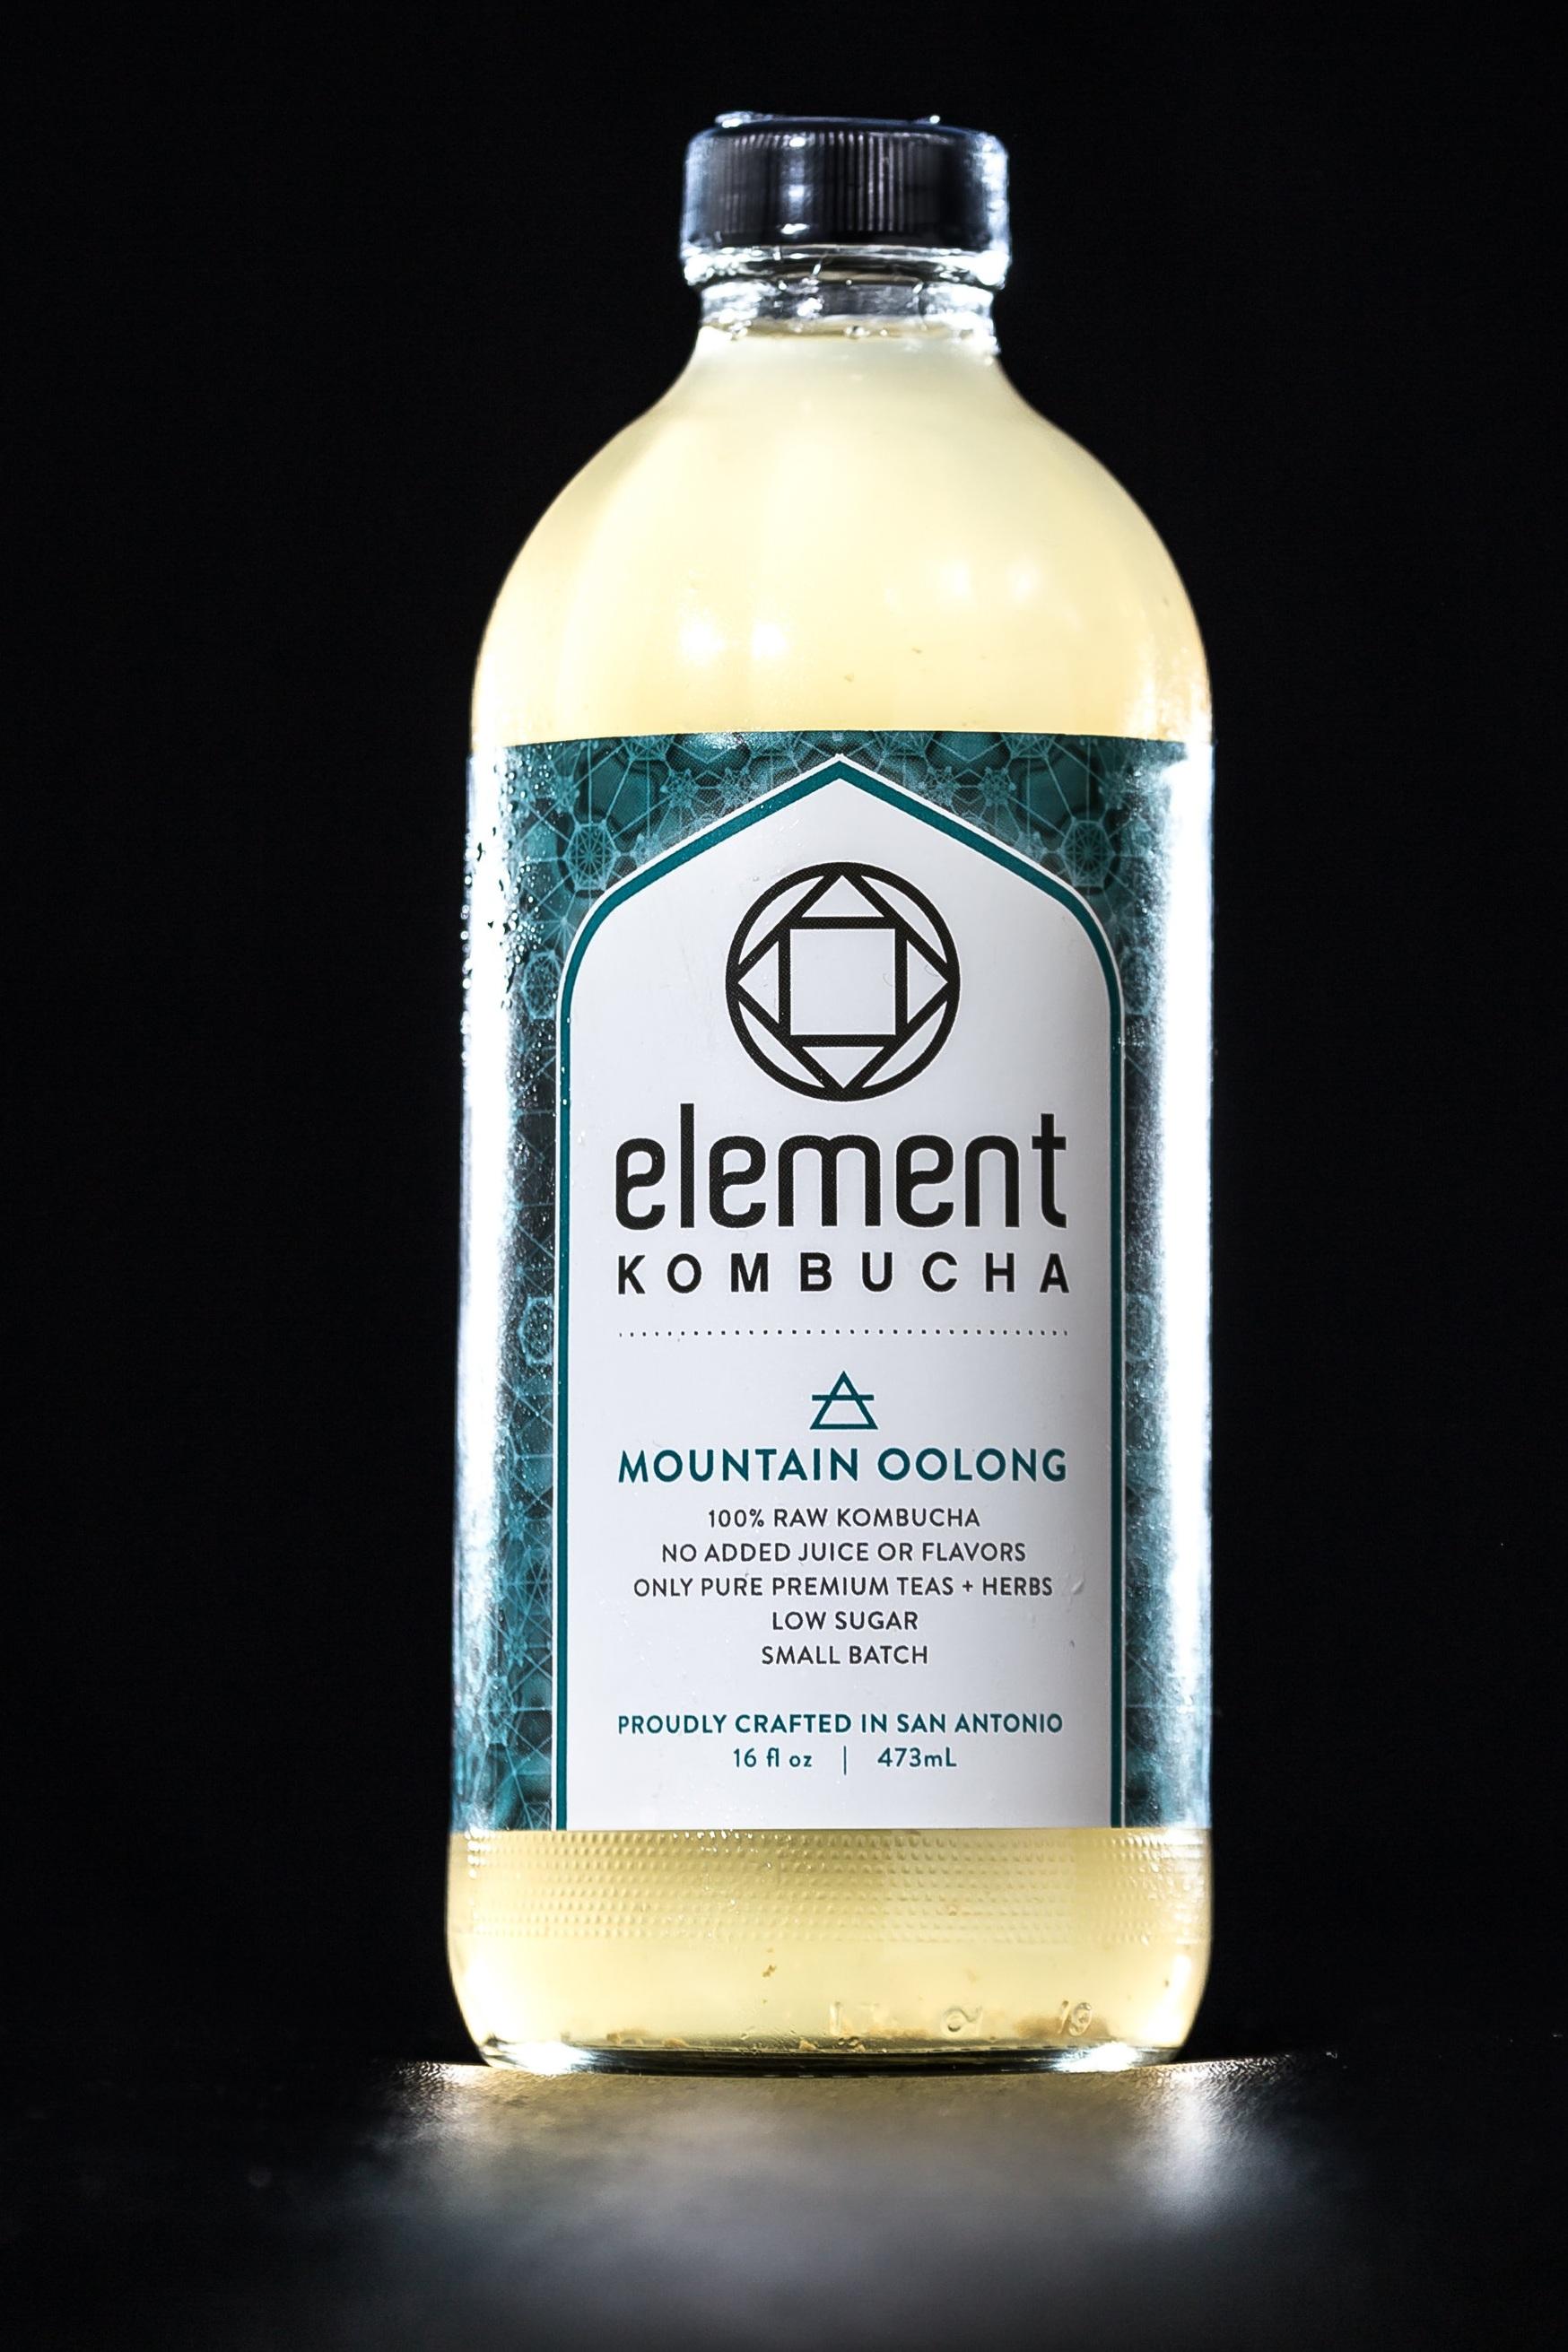 Element Kombucha Mountain oolong